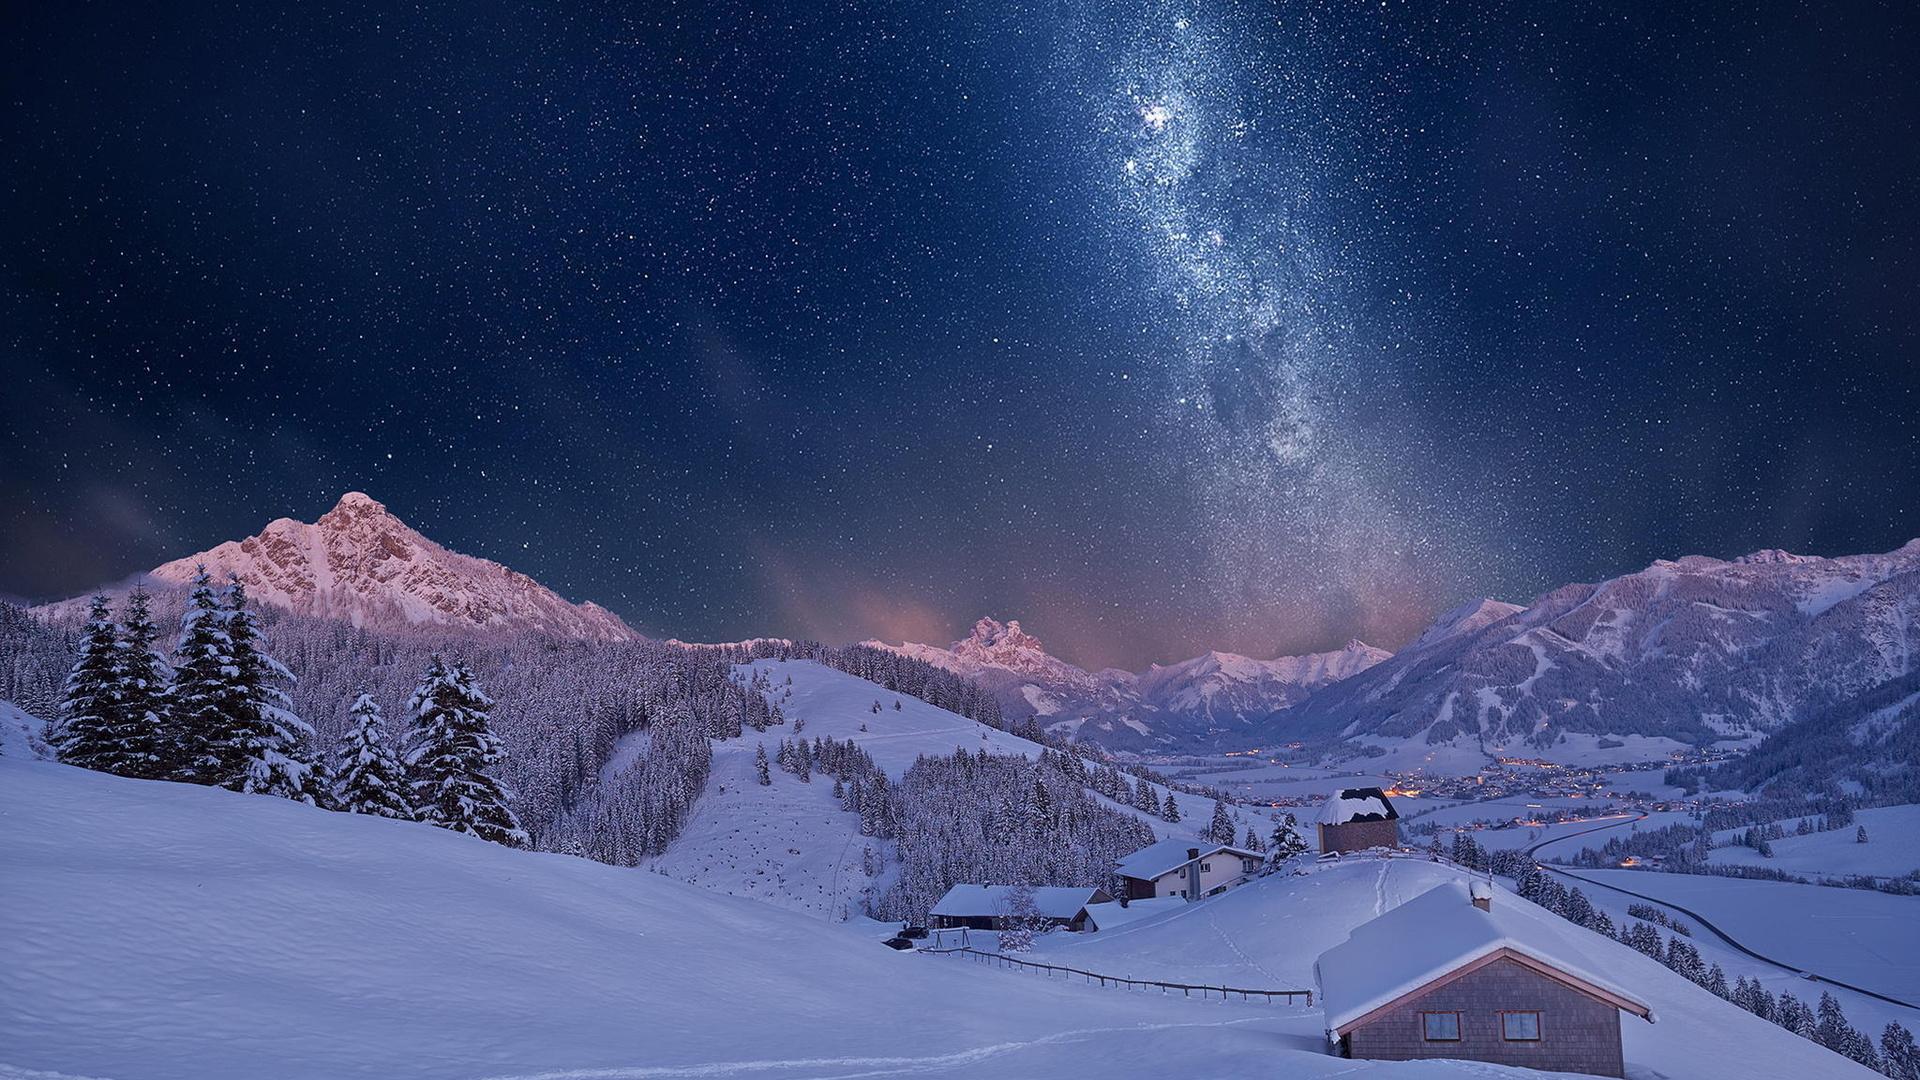 Milky Way Sky Over Winter Village Hd Wallpaper